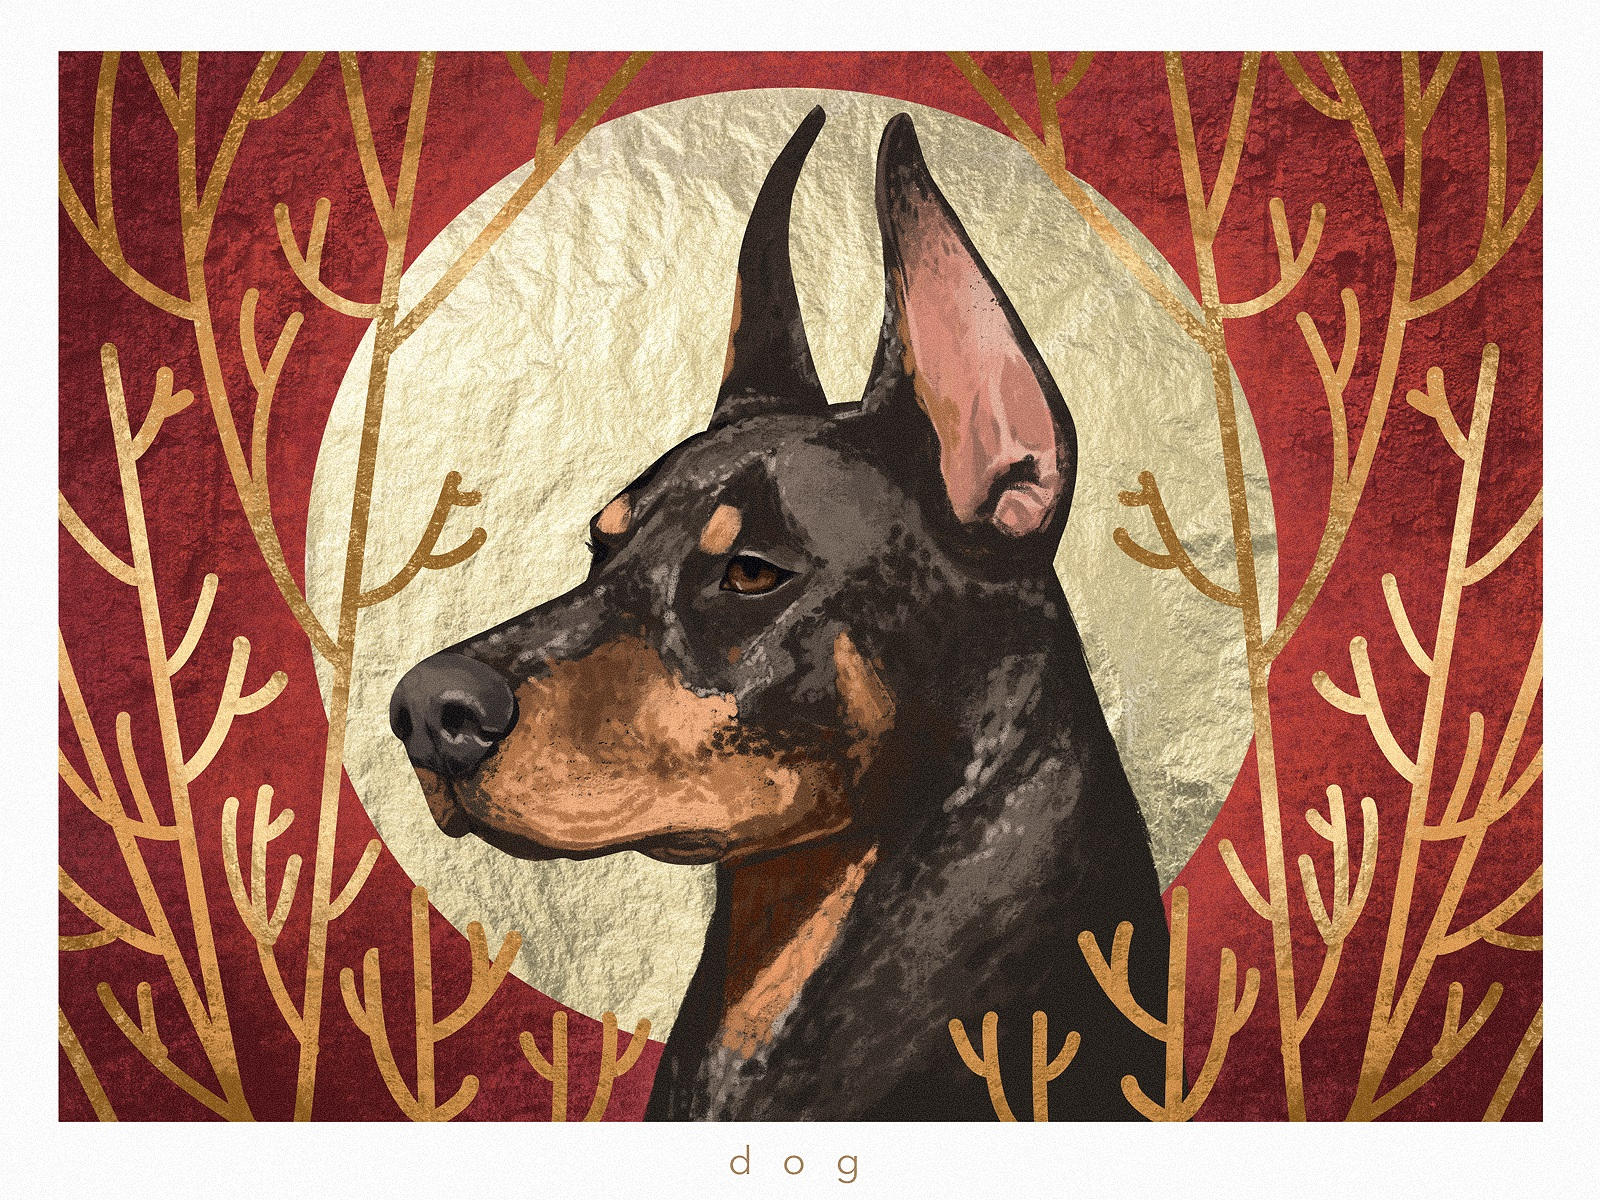 animal dog portrait illustration tubikarts